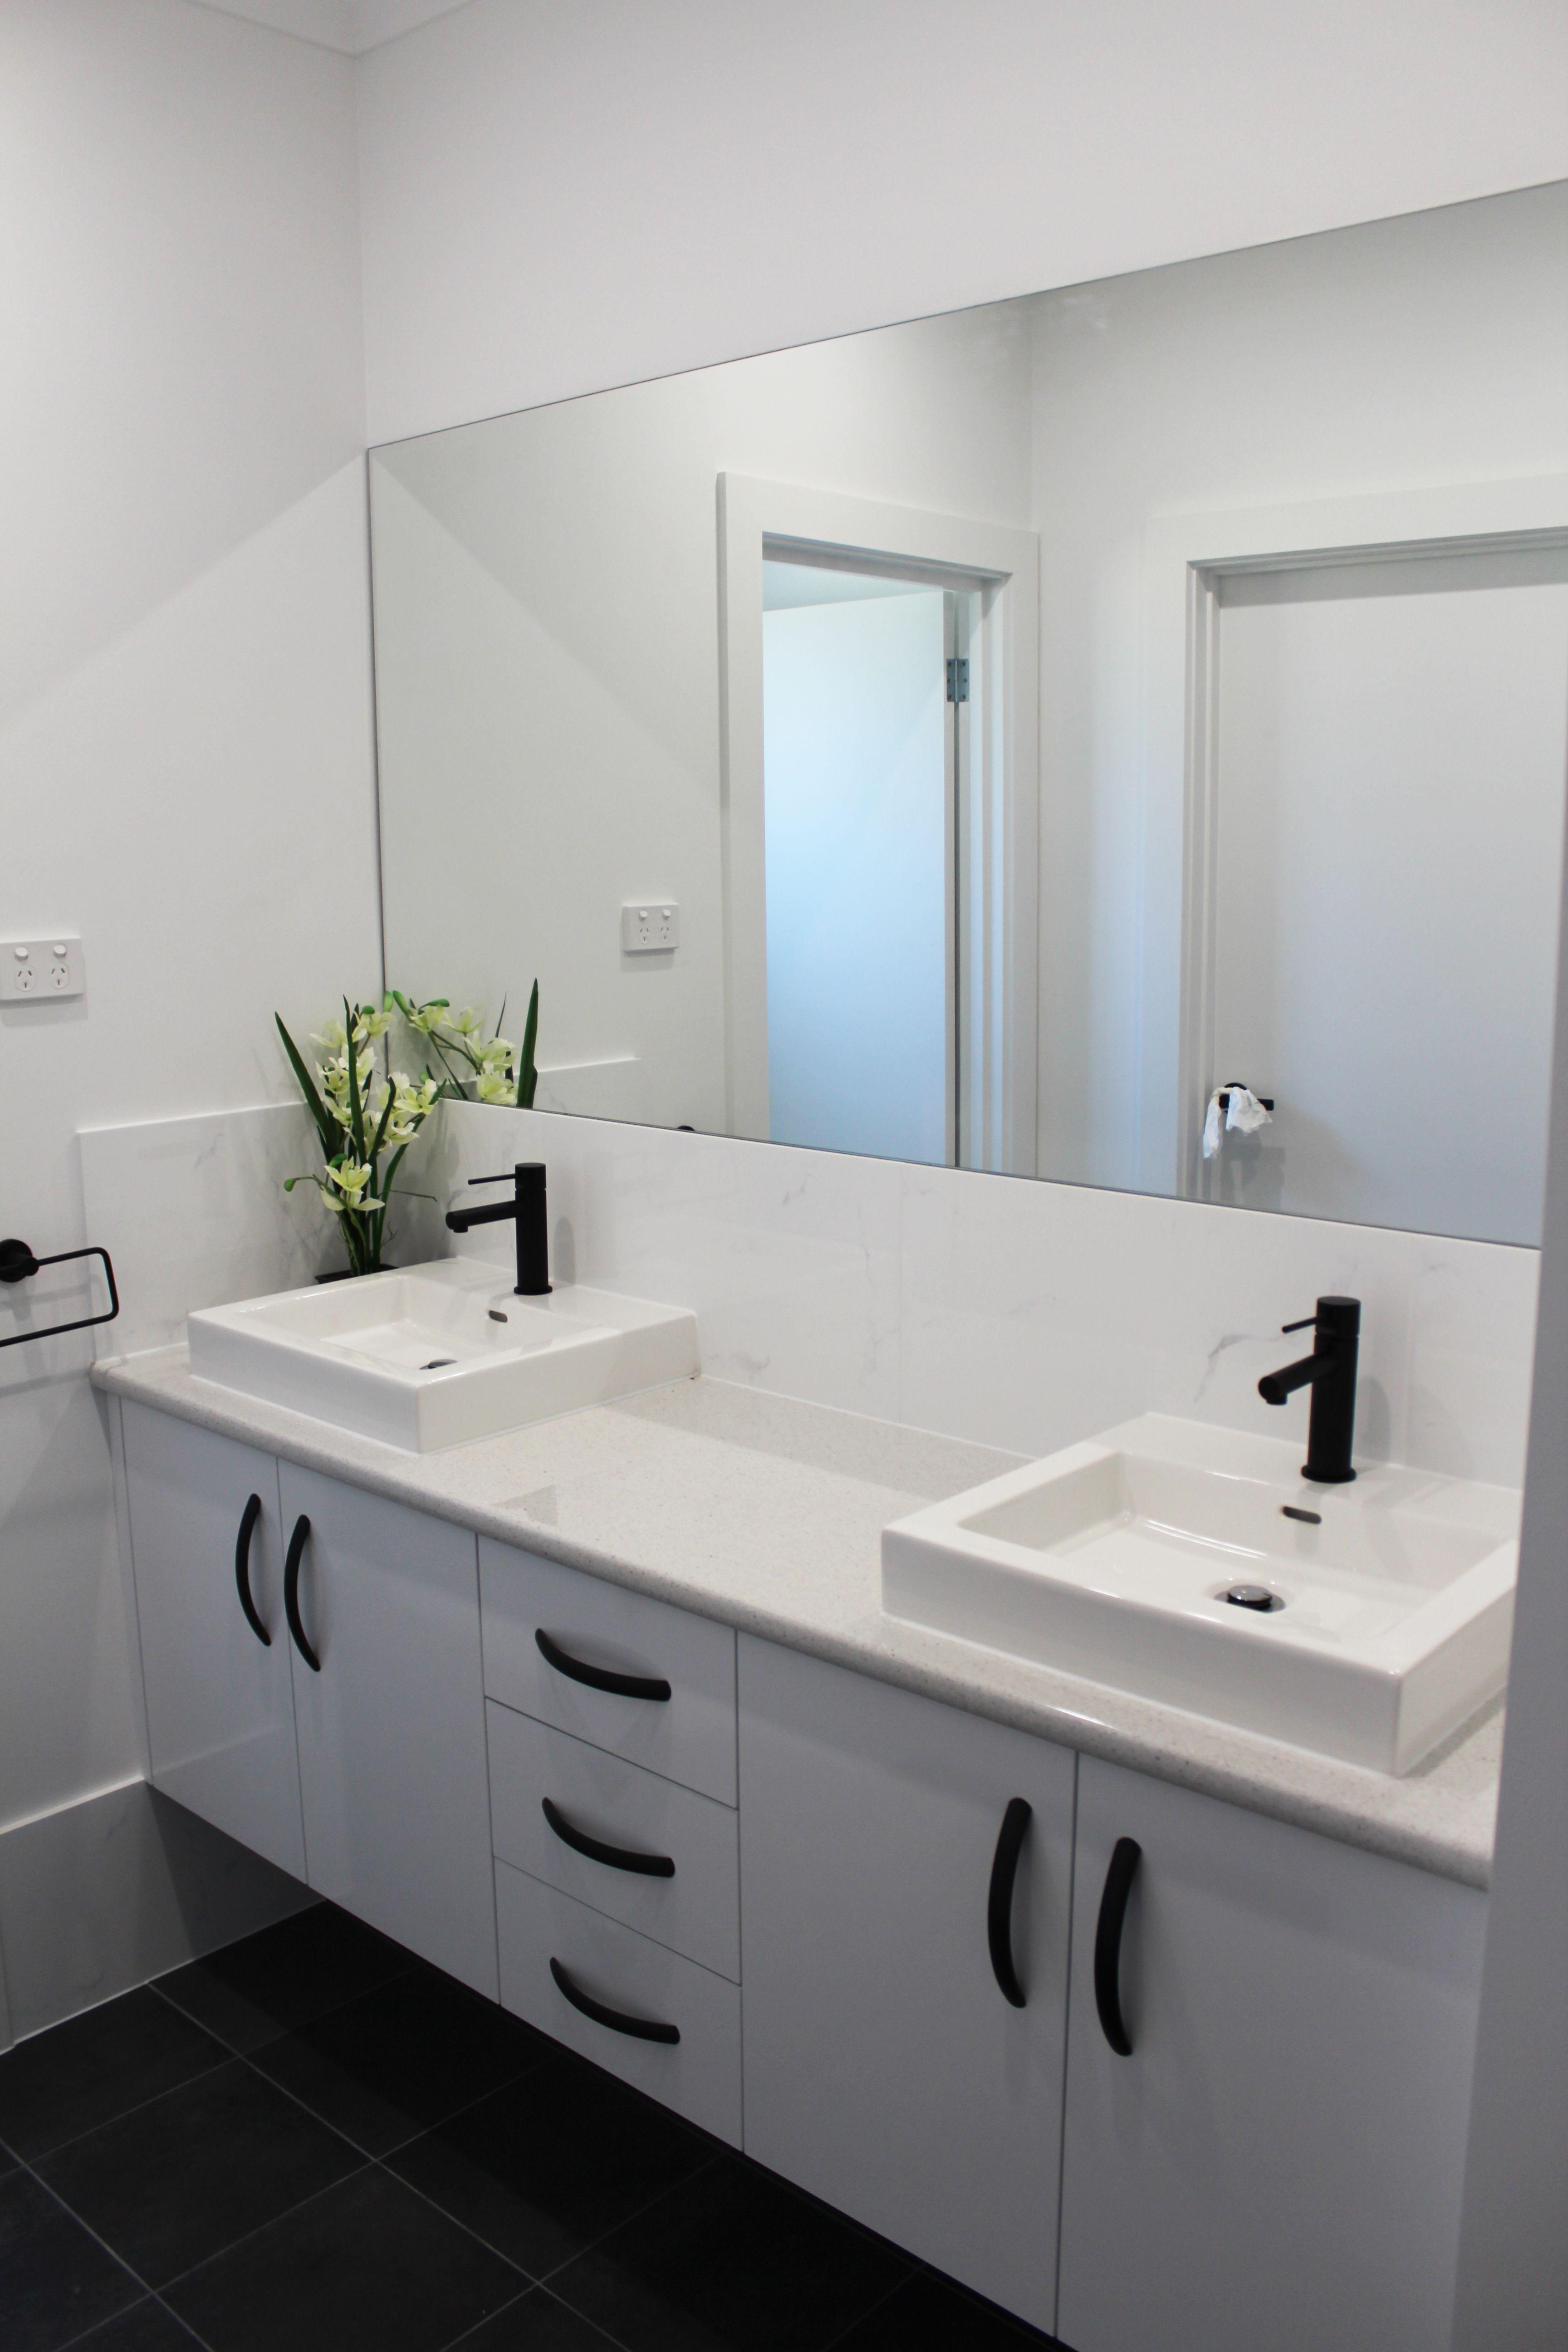 Home Goods Bathroom Wall Decor: Vanity With Snowdrift Gloss Doors, Pure Mineralstone